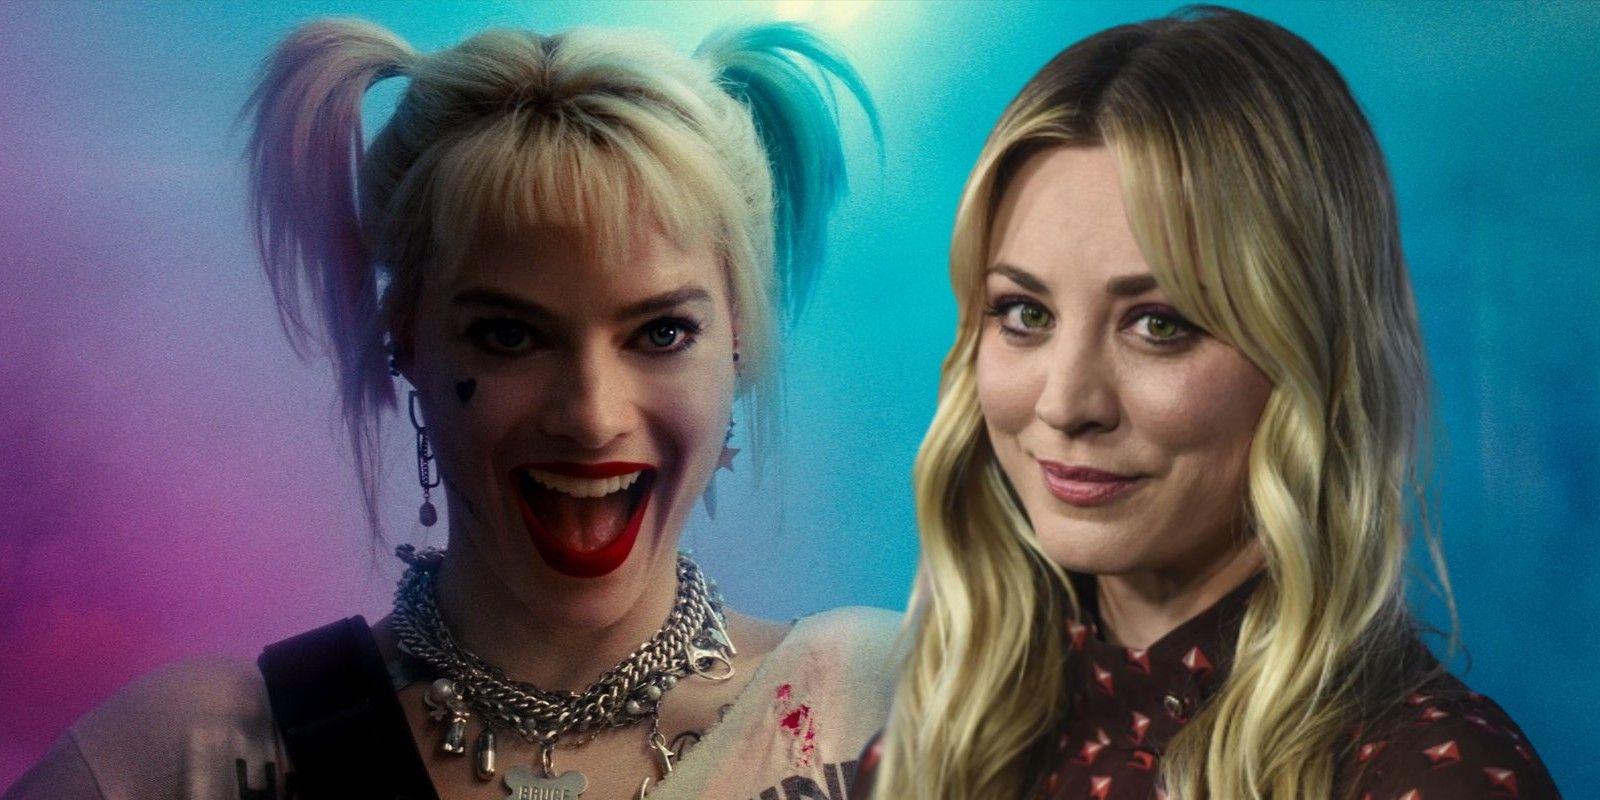 Harley Quinn S Kaley Cuoco Debunks Rumors Of Feud With Margot Robbie